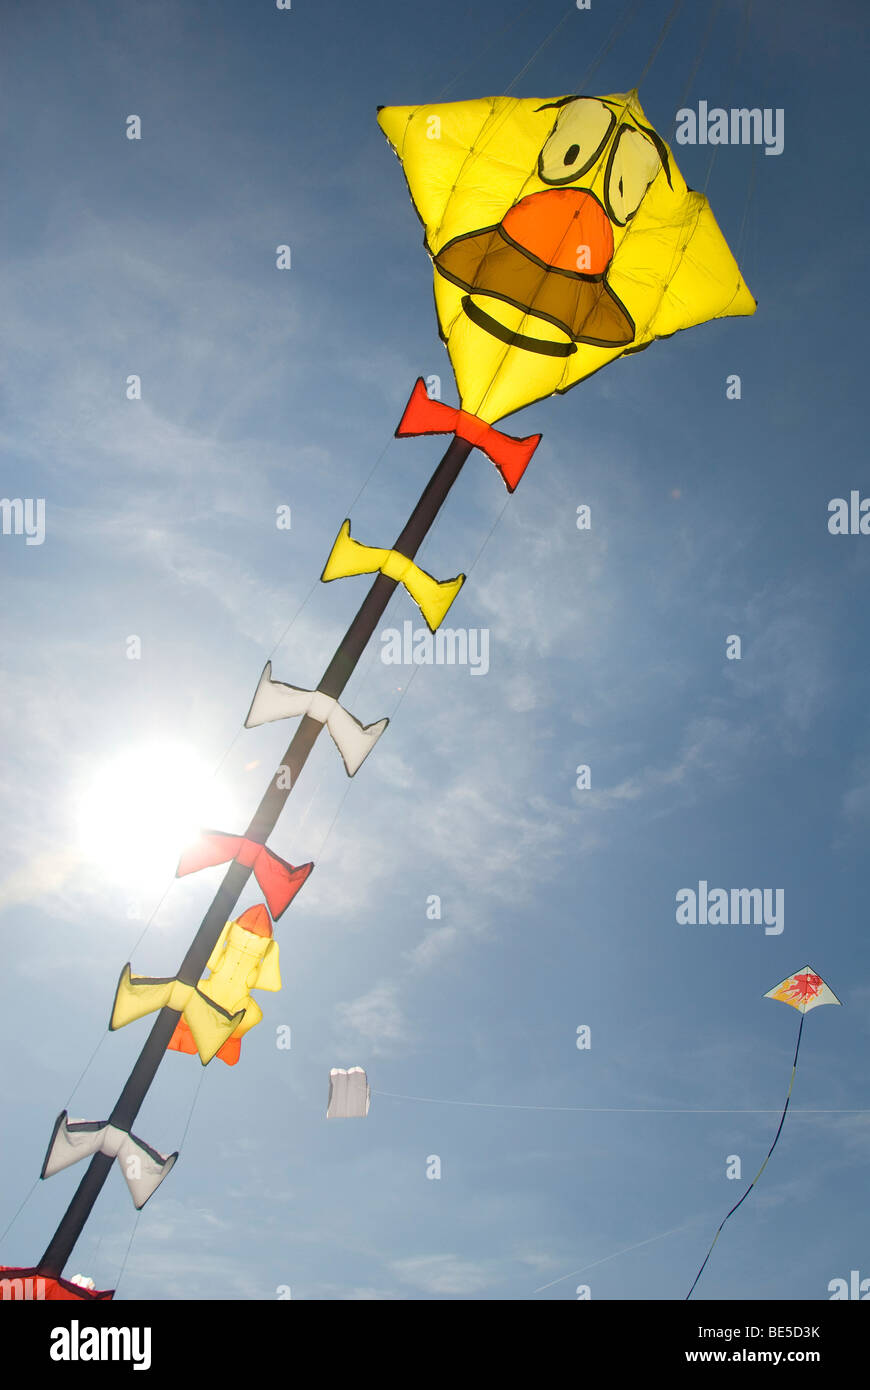 Large Kite with face, International Kite Festival, Bristol, UK Stock Photo